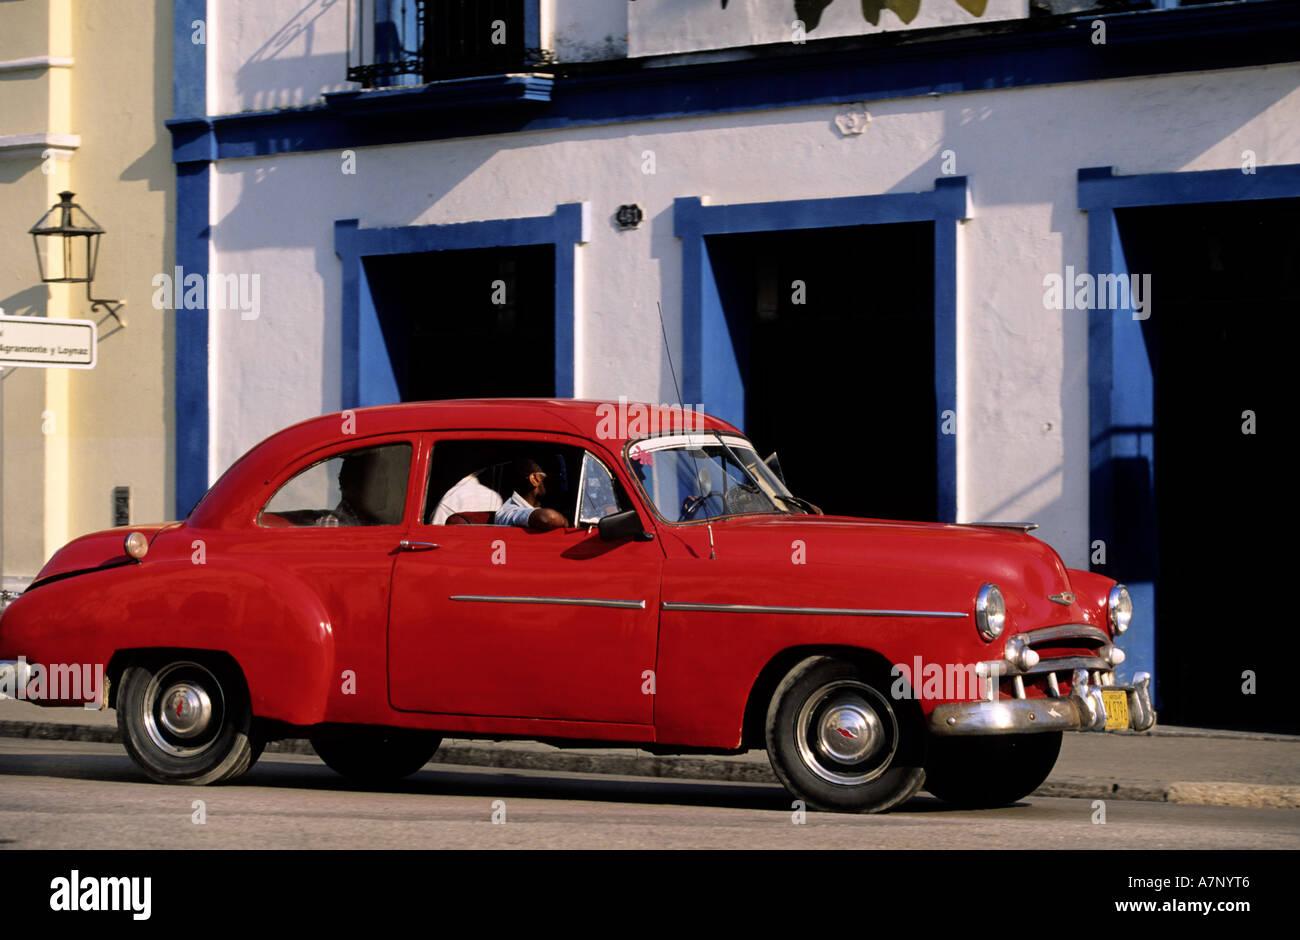 Cuba, Sancti Spiritus, old American car of the 50's - Stock Image